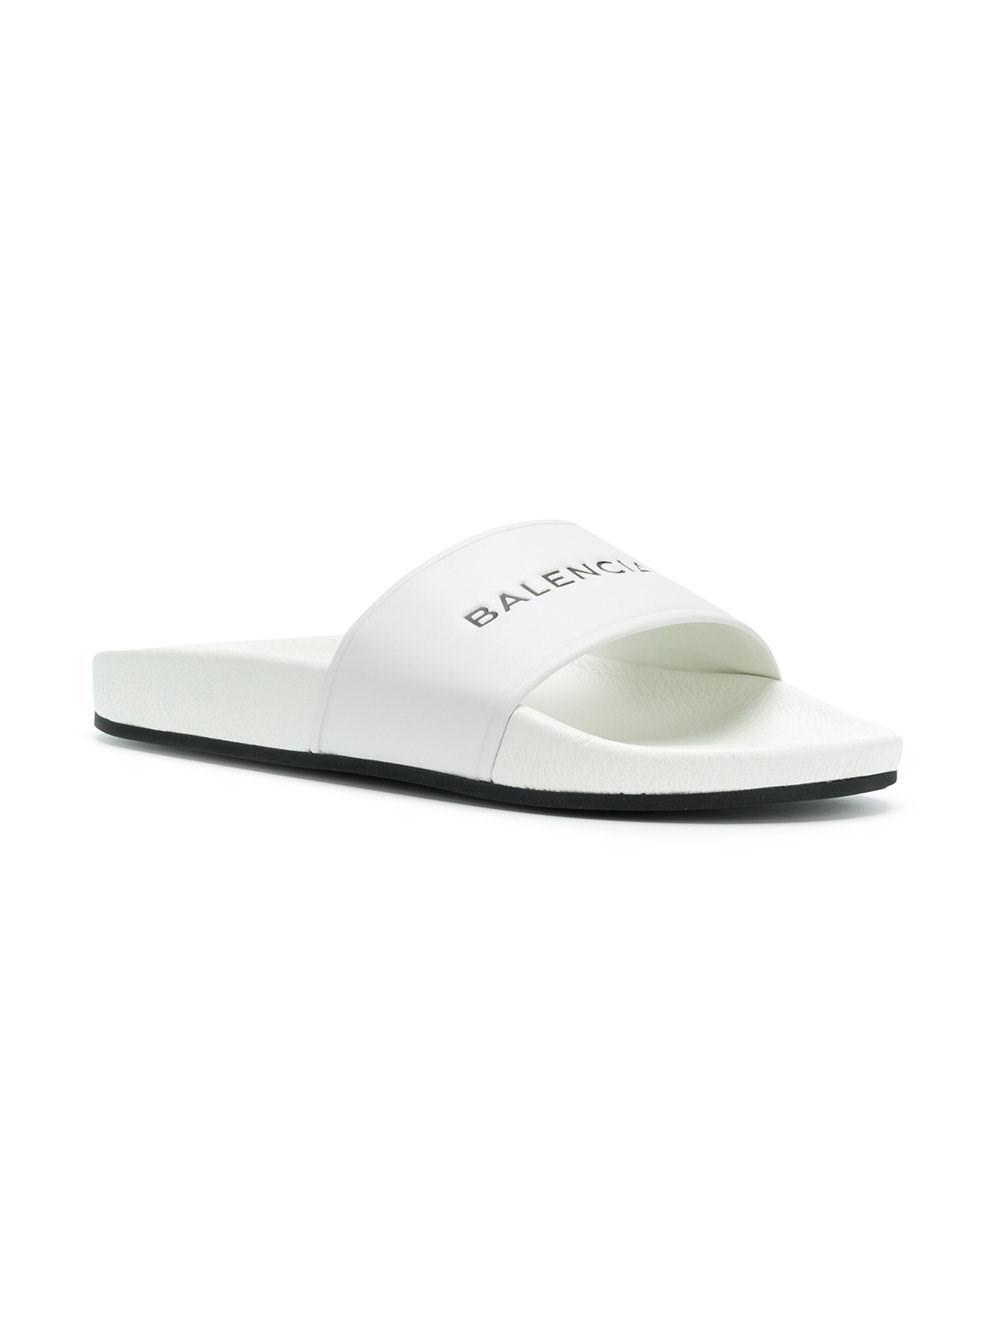 2f20361568b2 Lyst - Balmain Flip Flops   Slides 500573 Wal00 9061 in White